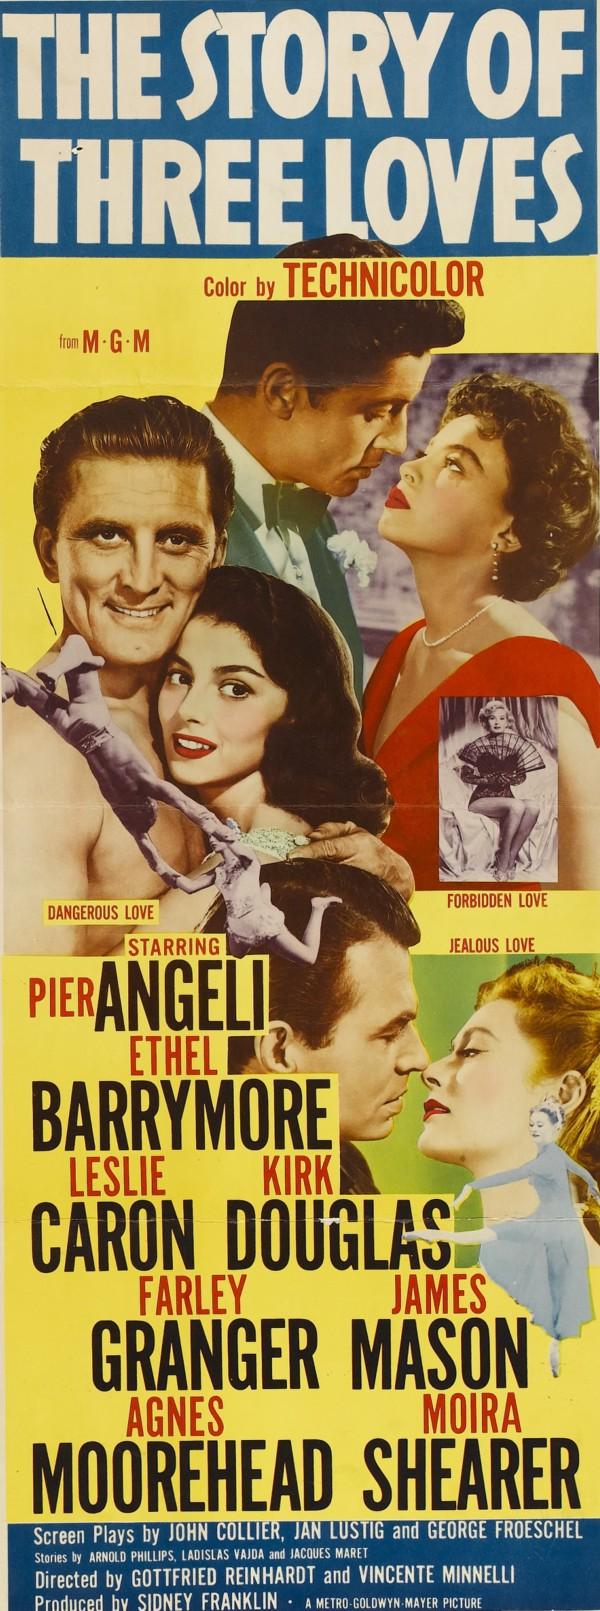 The Story of Three Loves filmsgradedcom The Story of Three Loves 1953